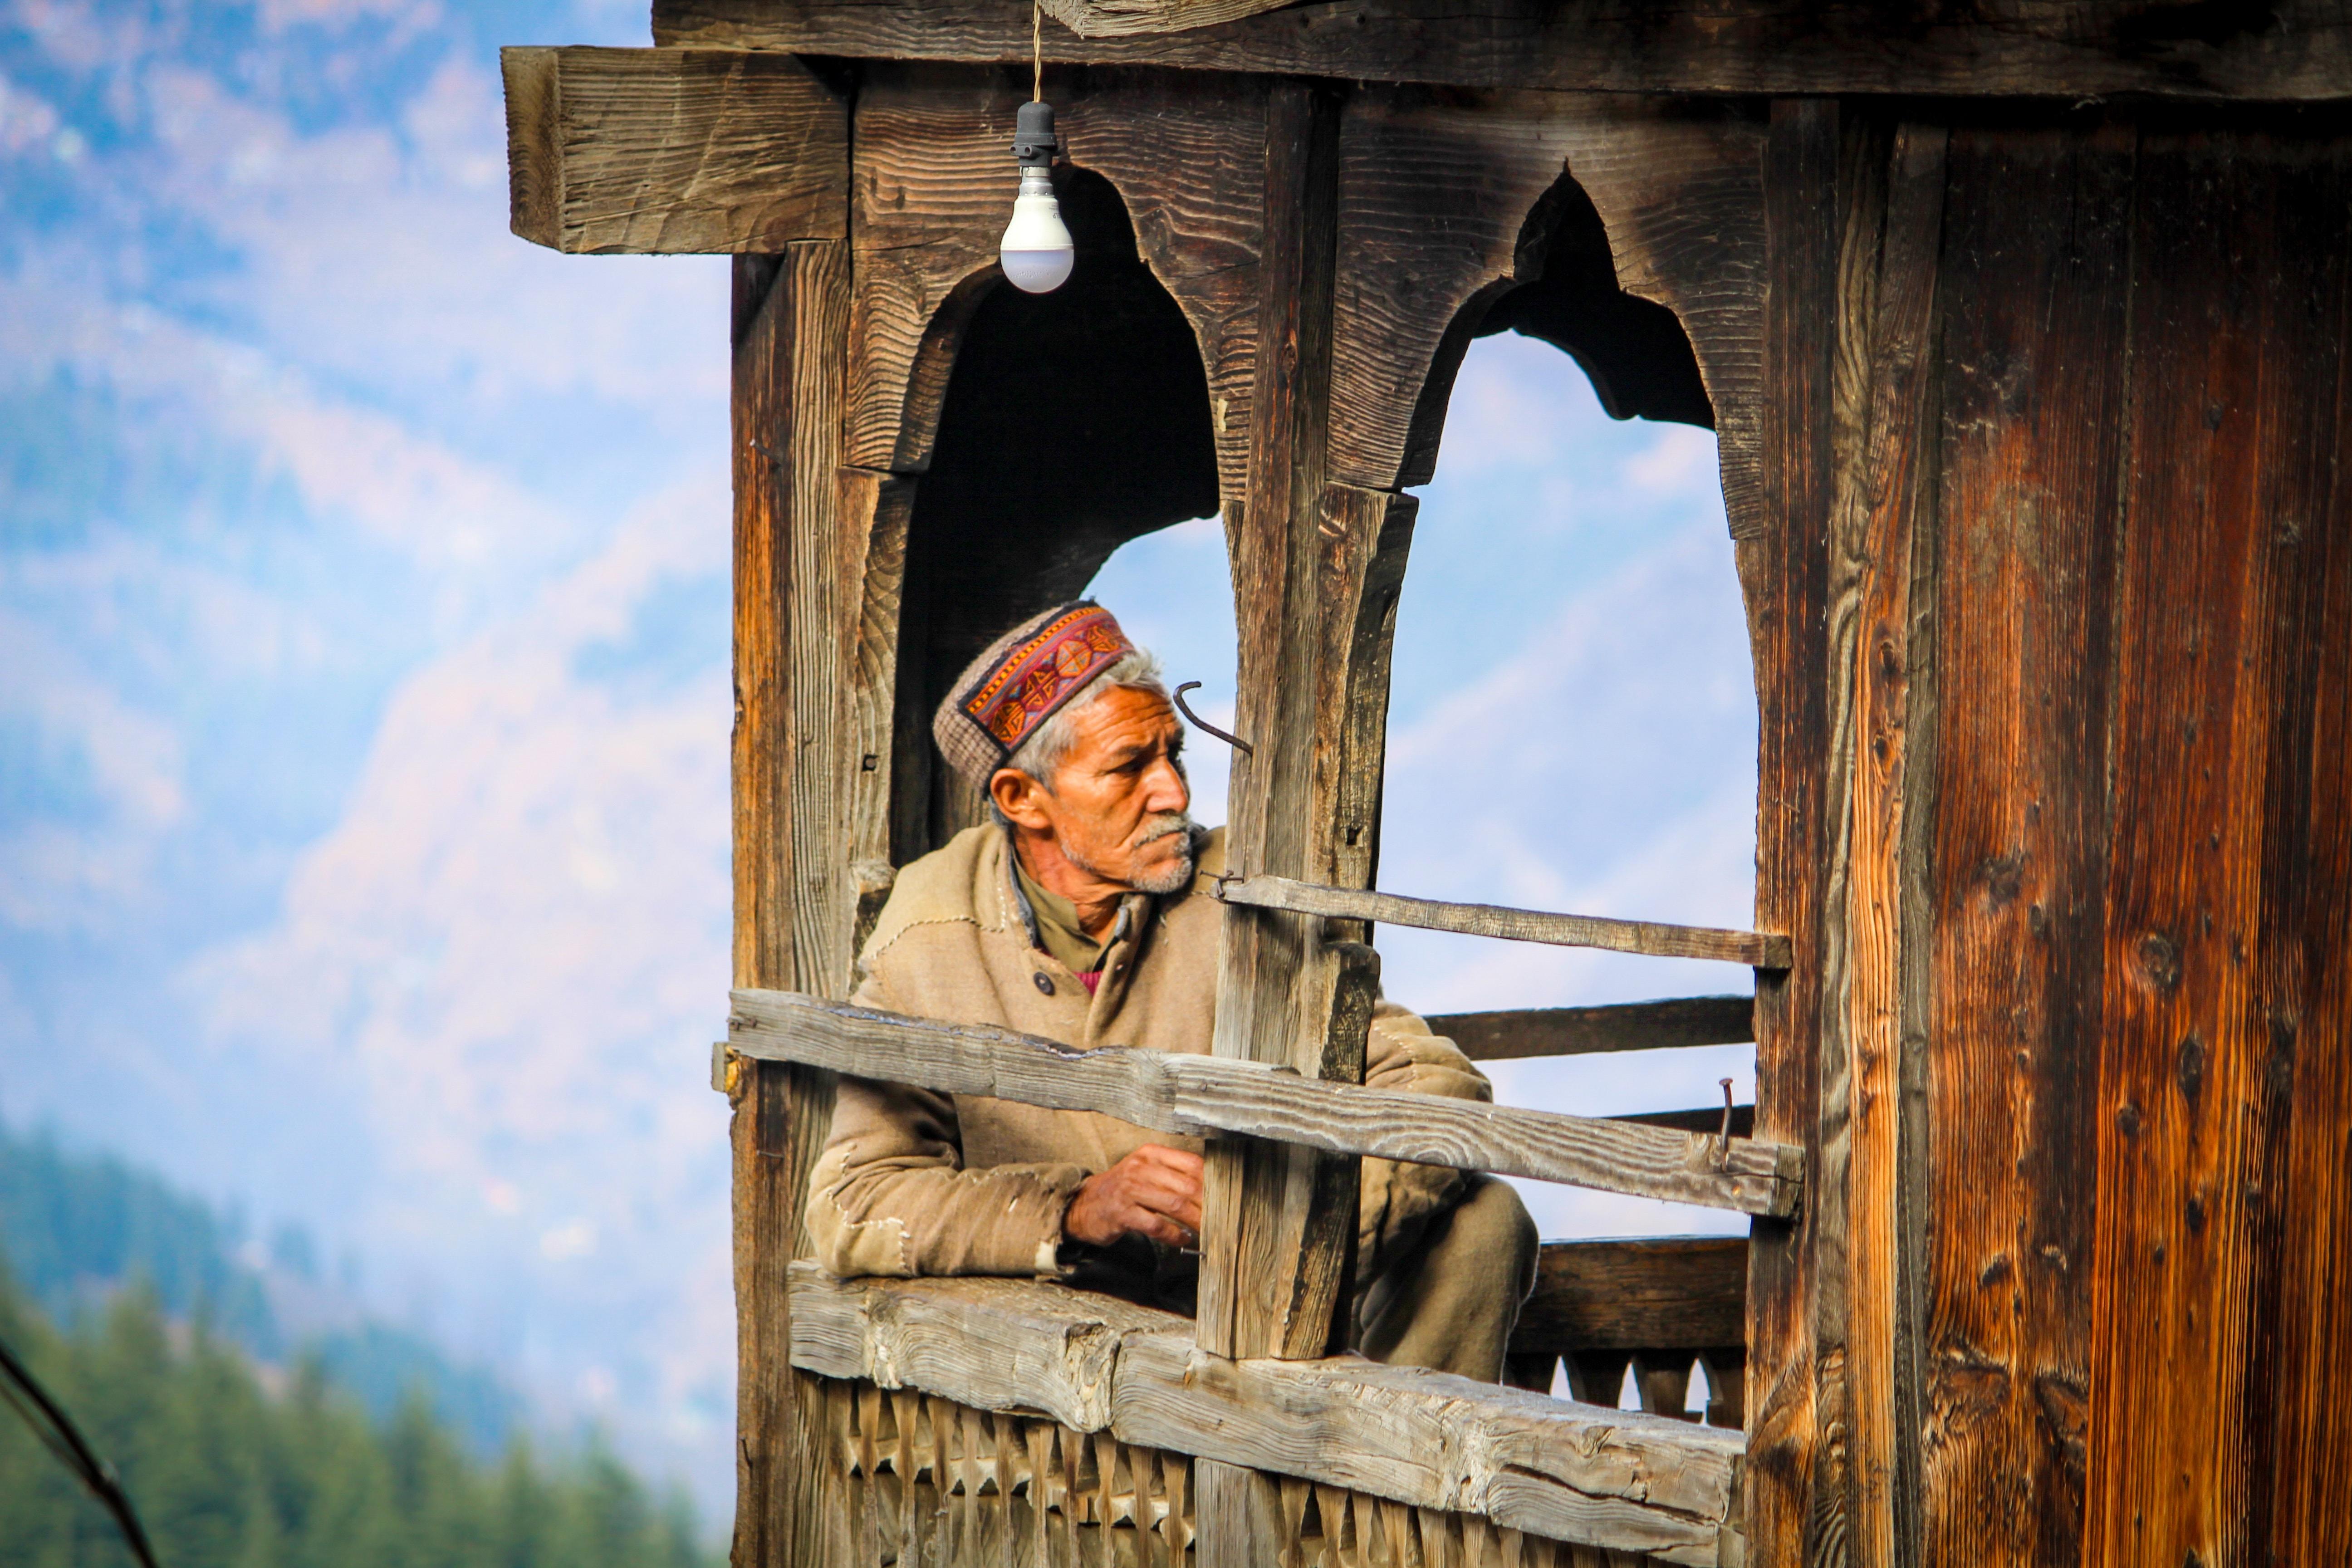 sitting man inside brown wooden building